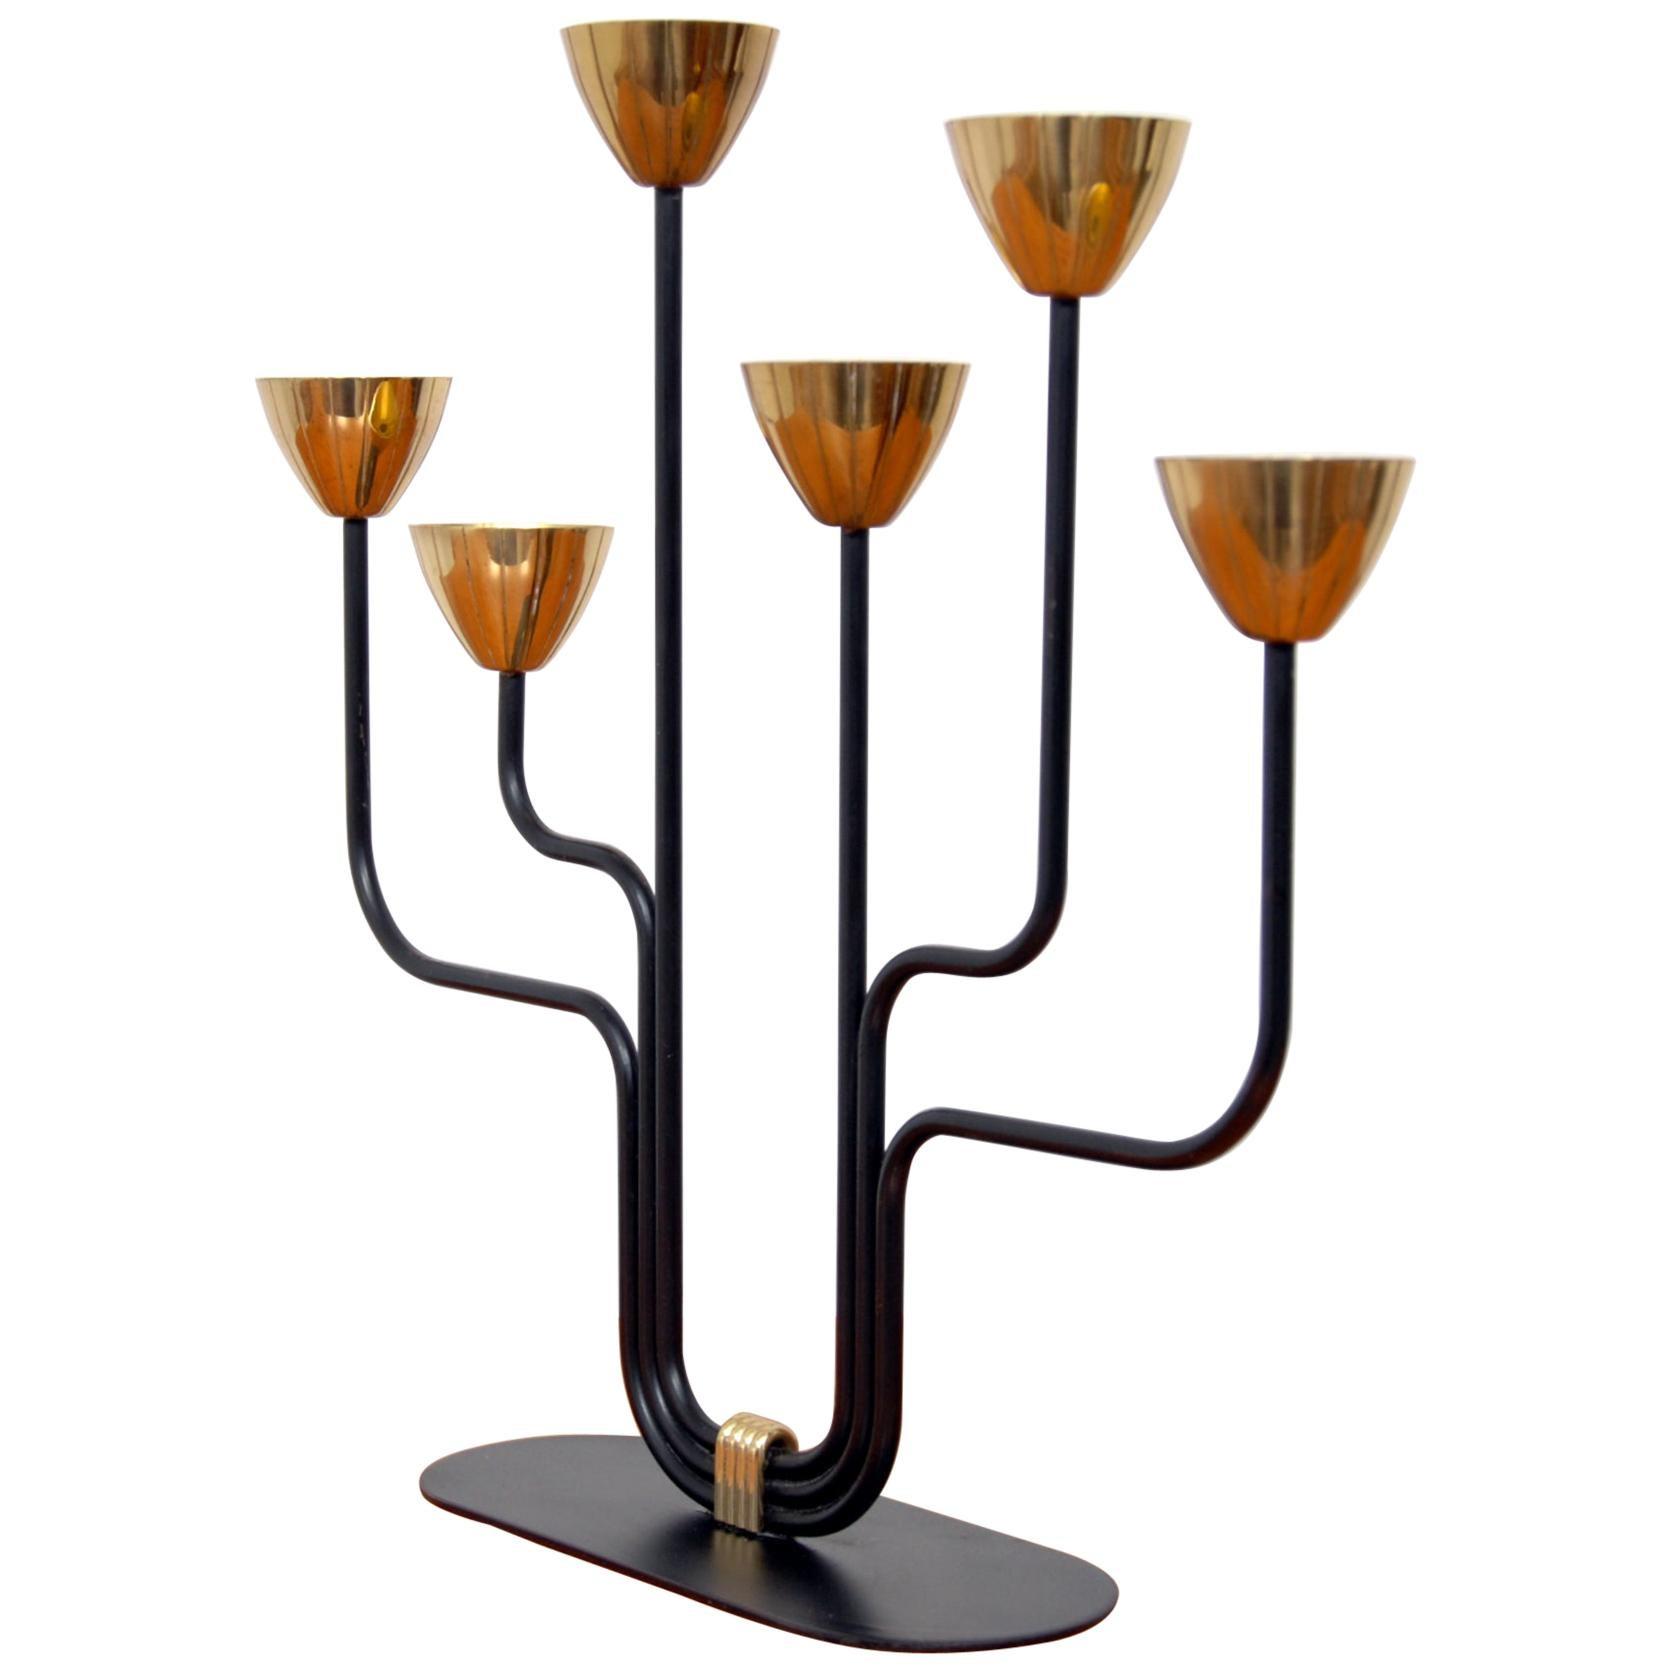 Brass Candleholder by Gunnar Ander for Ystad Metall, Sweden